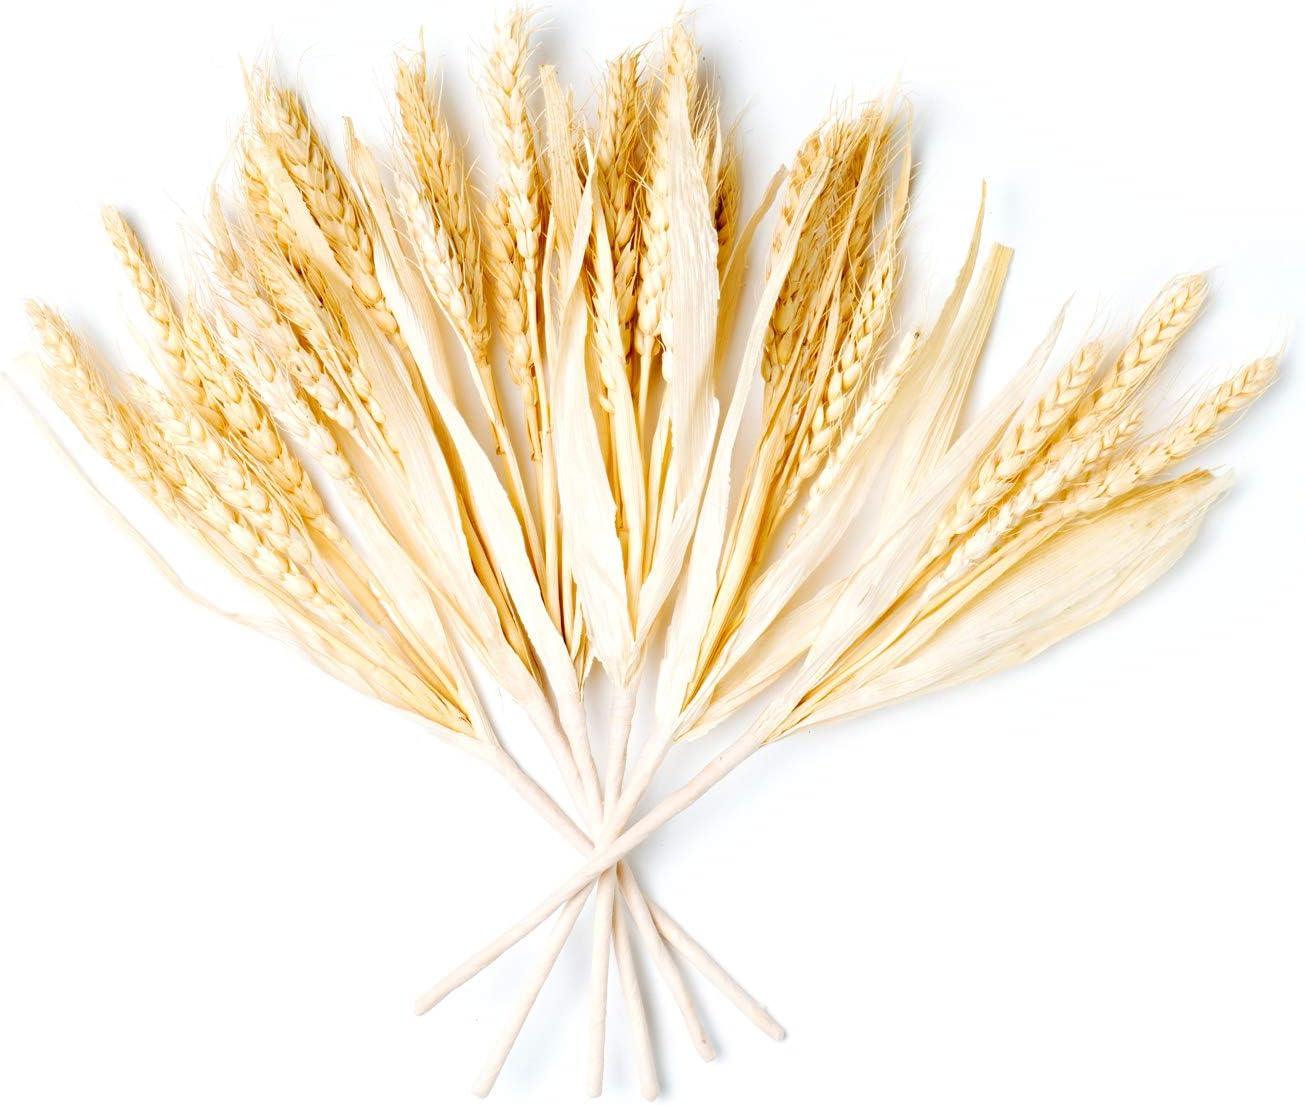 CraftMore Wheat Fall Pick Set of 6